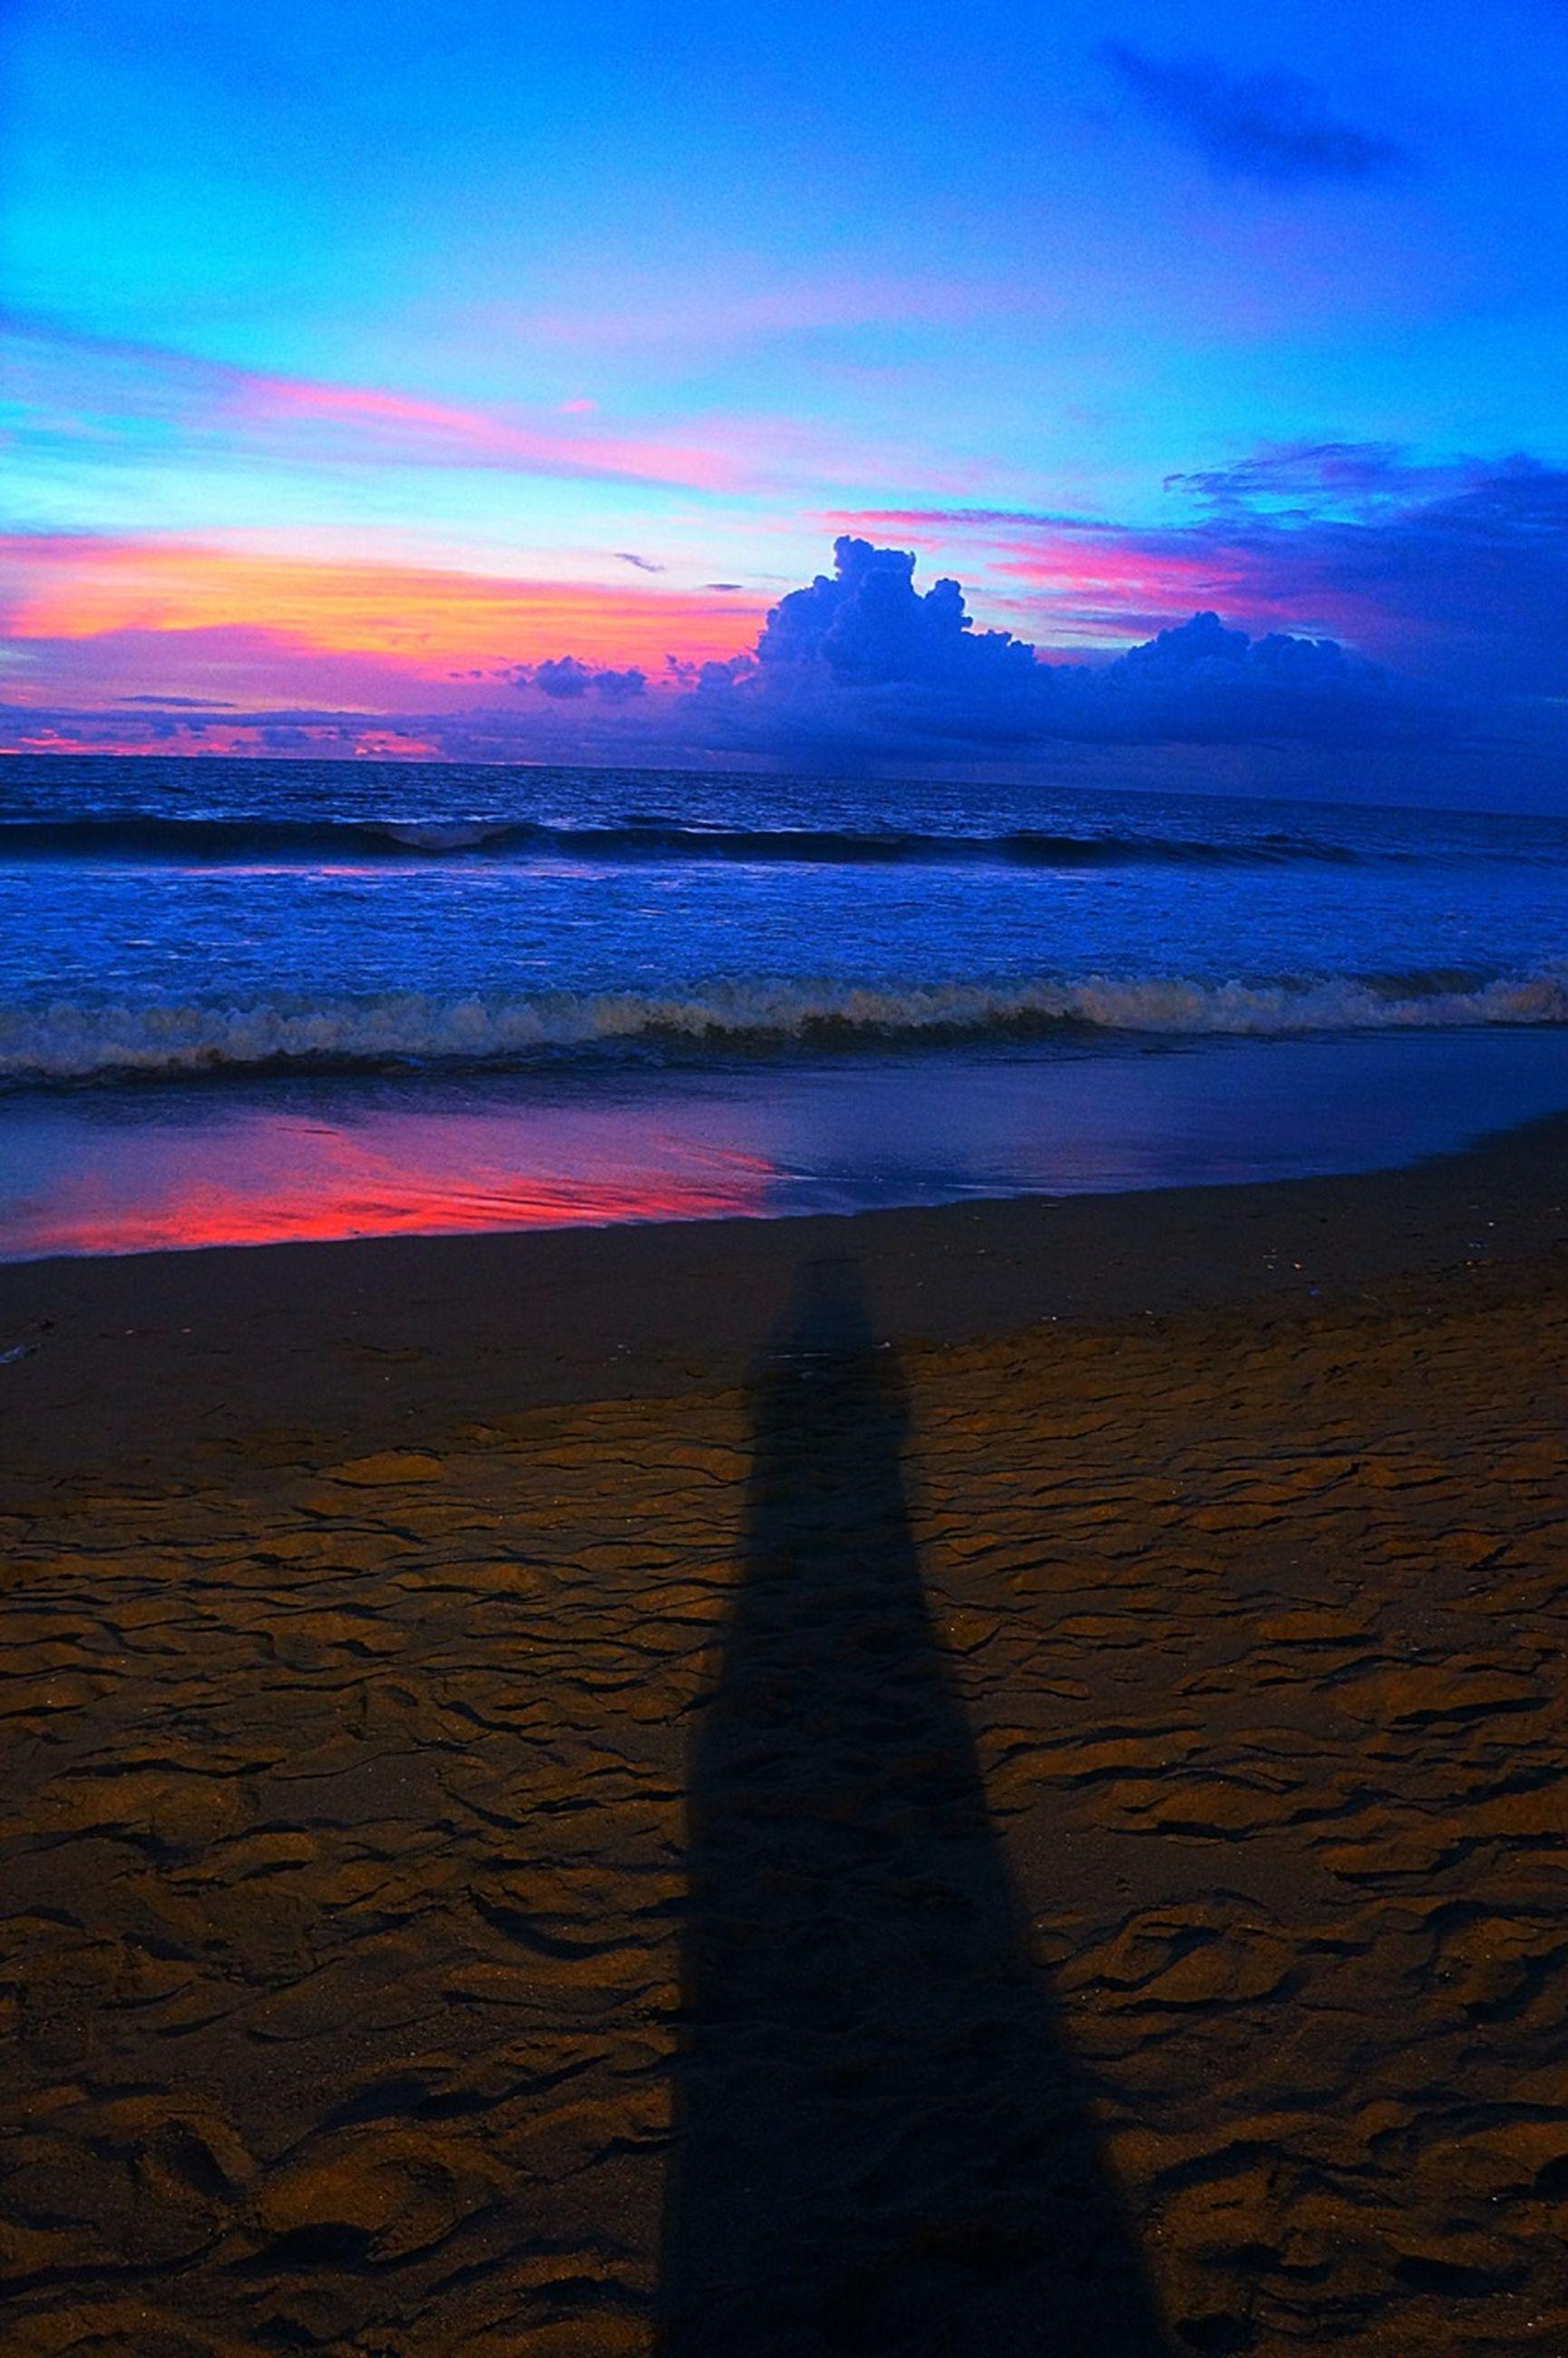 sea, beach, water, sky, sunset, horizon over water, tranquil scene, scenics, shore, tranquility, beauty in nature, sand, cloud - sky, silhouette, nature, idyllic, cloud, wave, coastline, sunlight